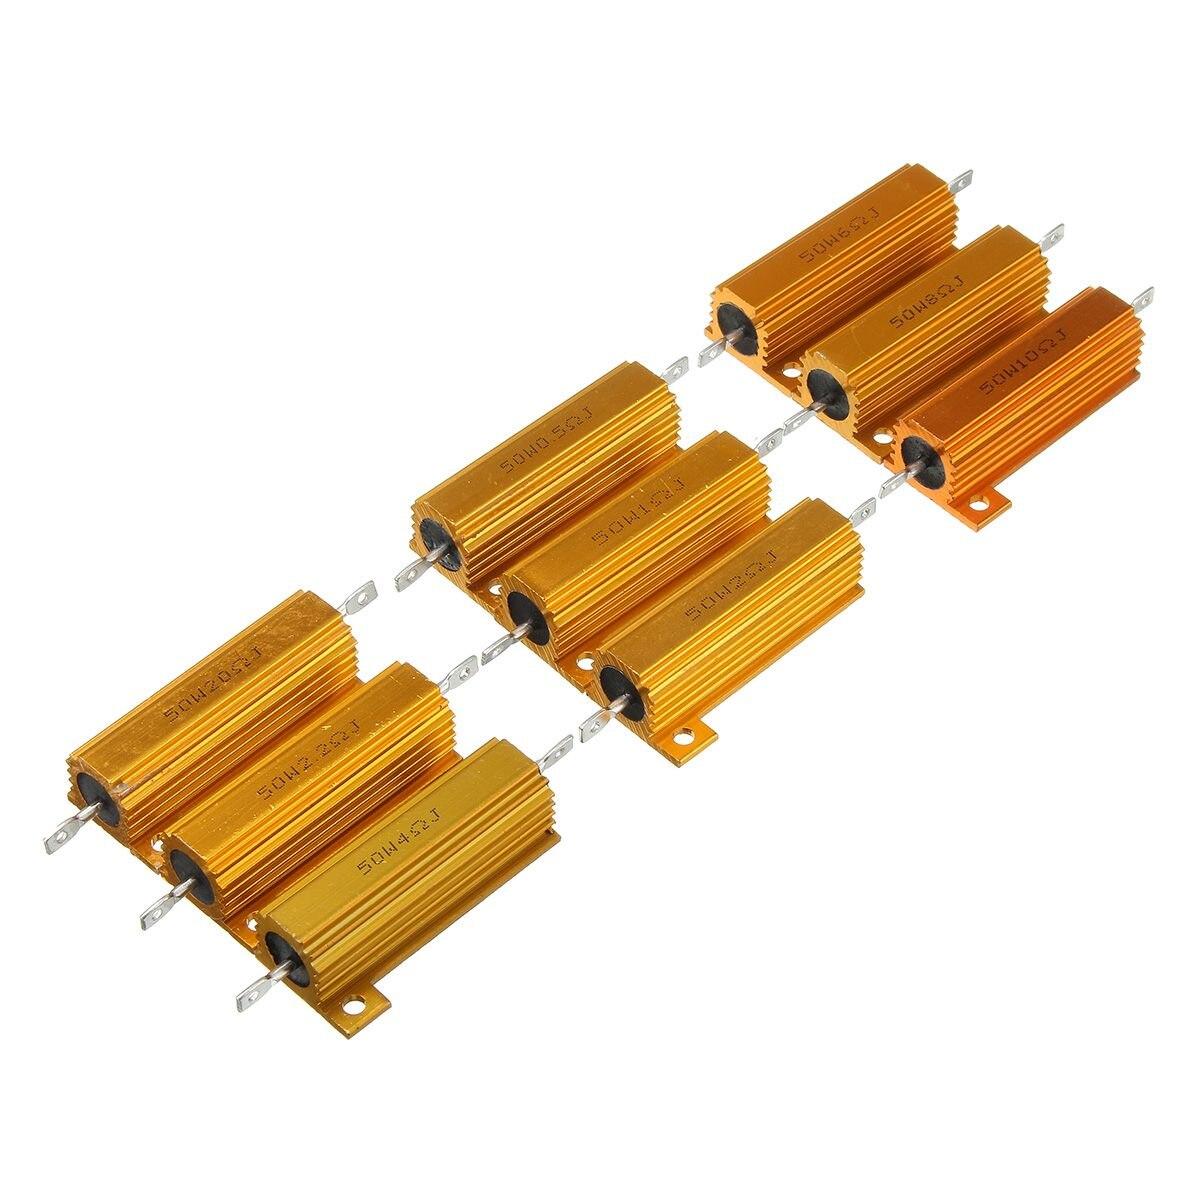 Nova marca 50 w 0.5 1 2 2.2 4 6 8 10 20 r ohm power caso escudo de metal resistor wirewound